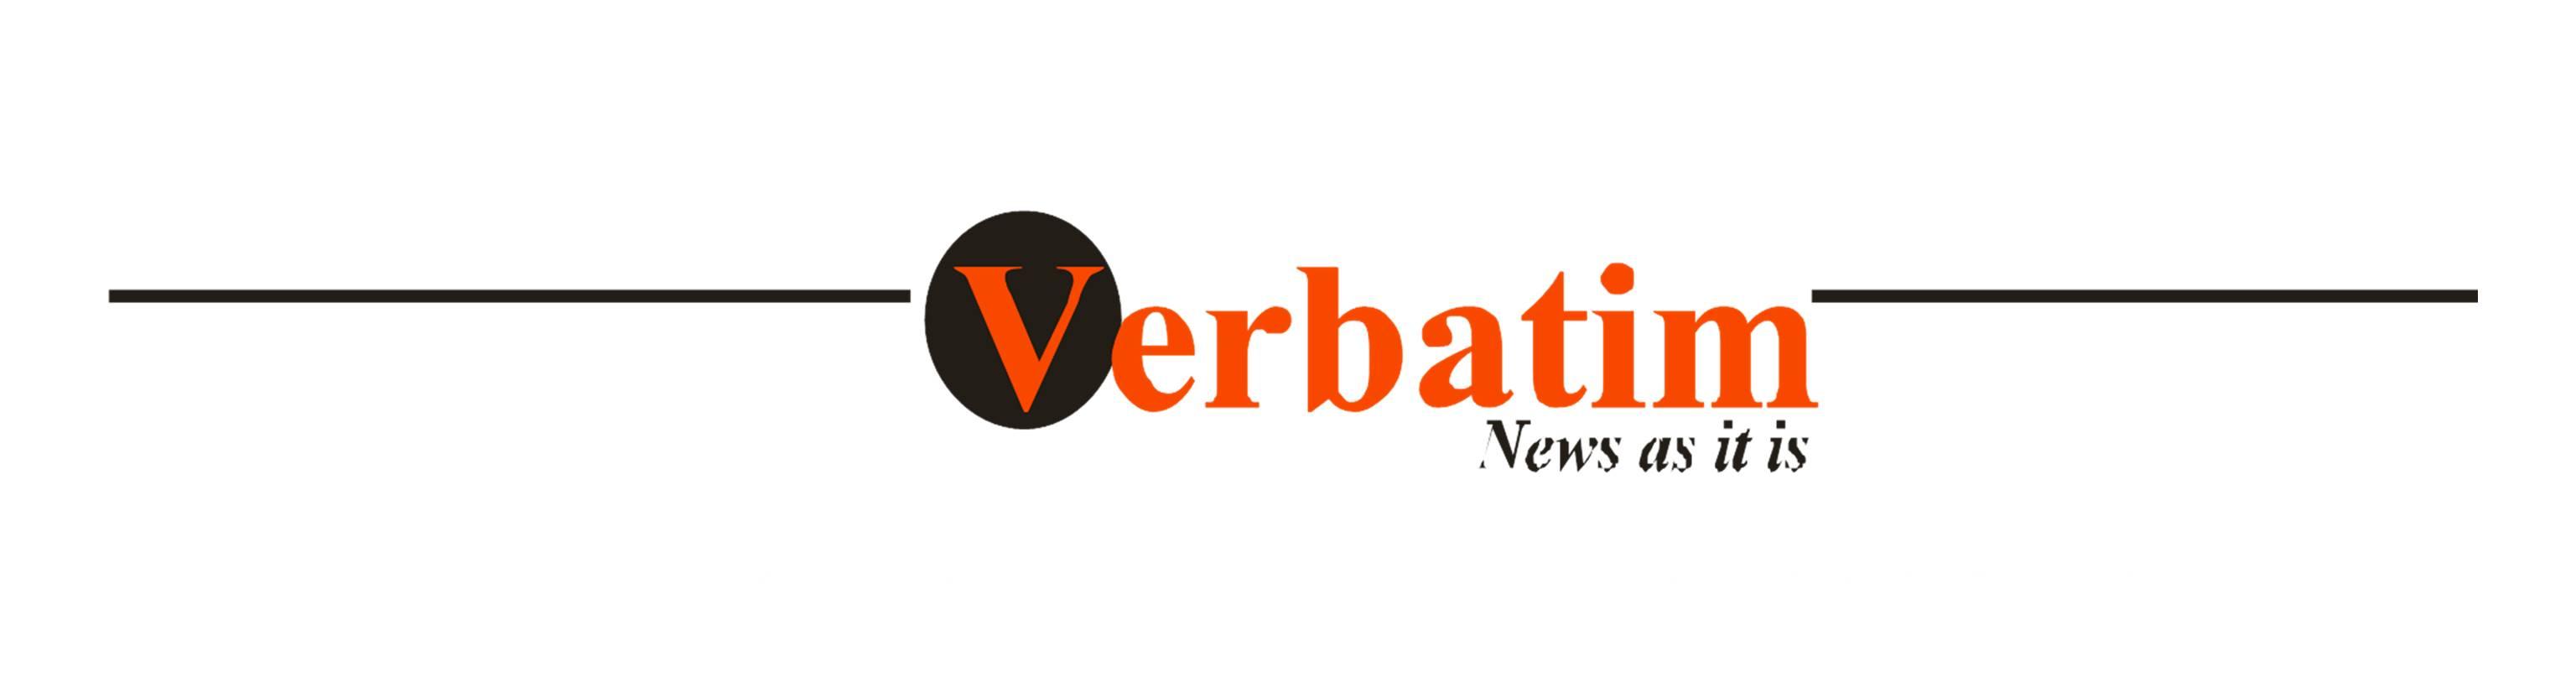 Verbatim Nigeria News Network